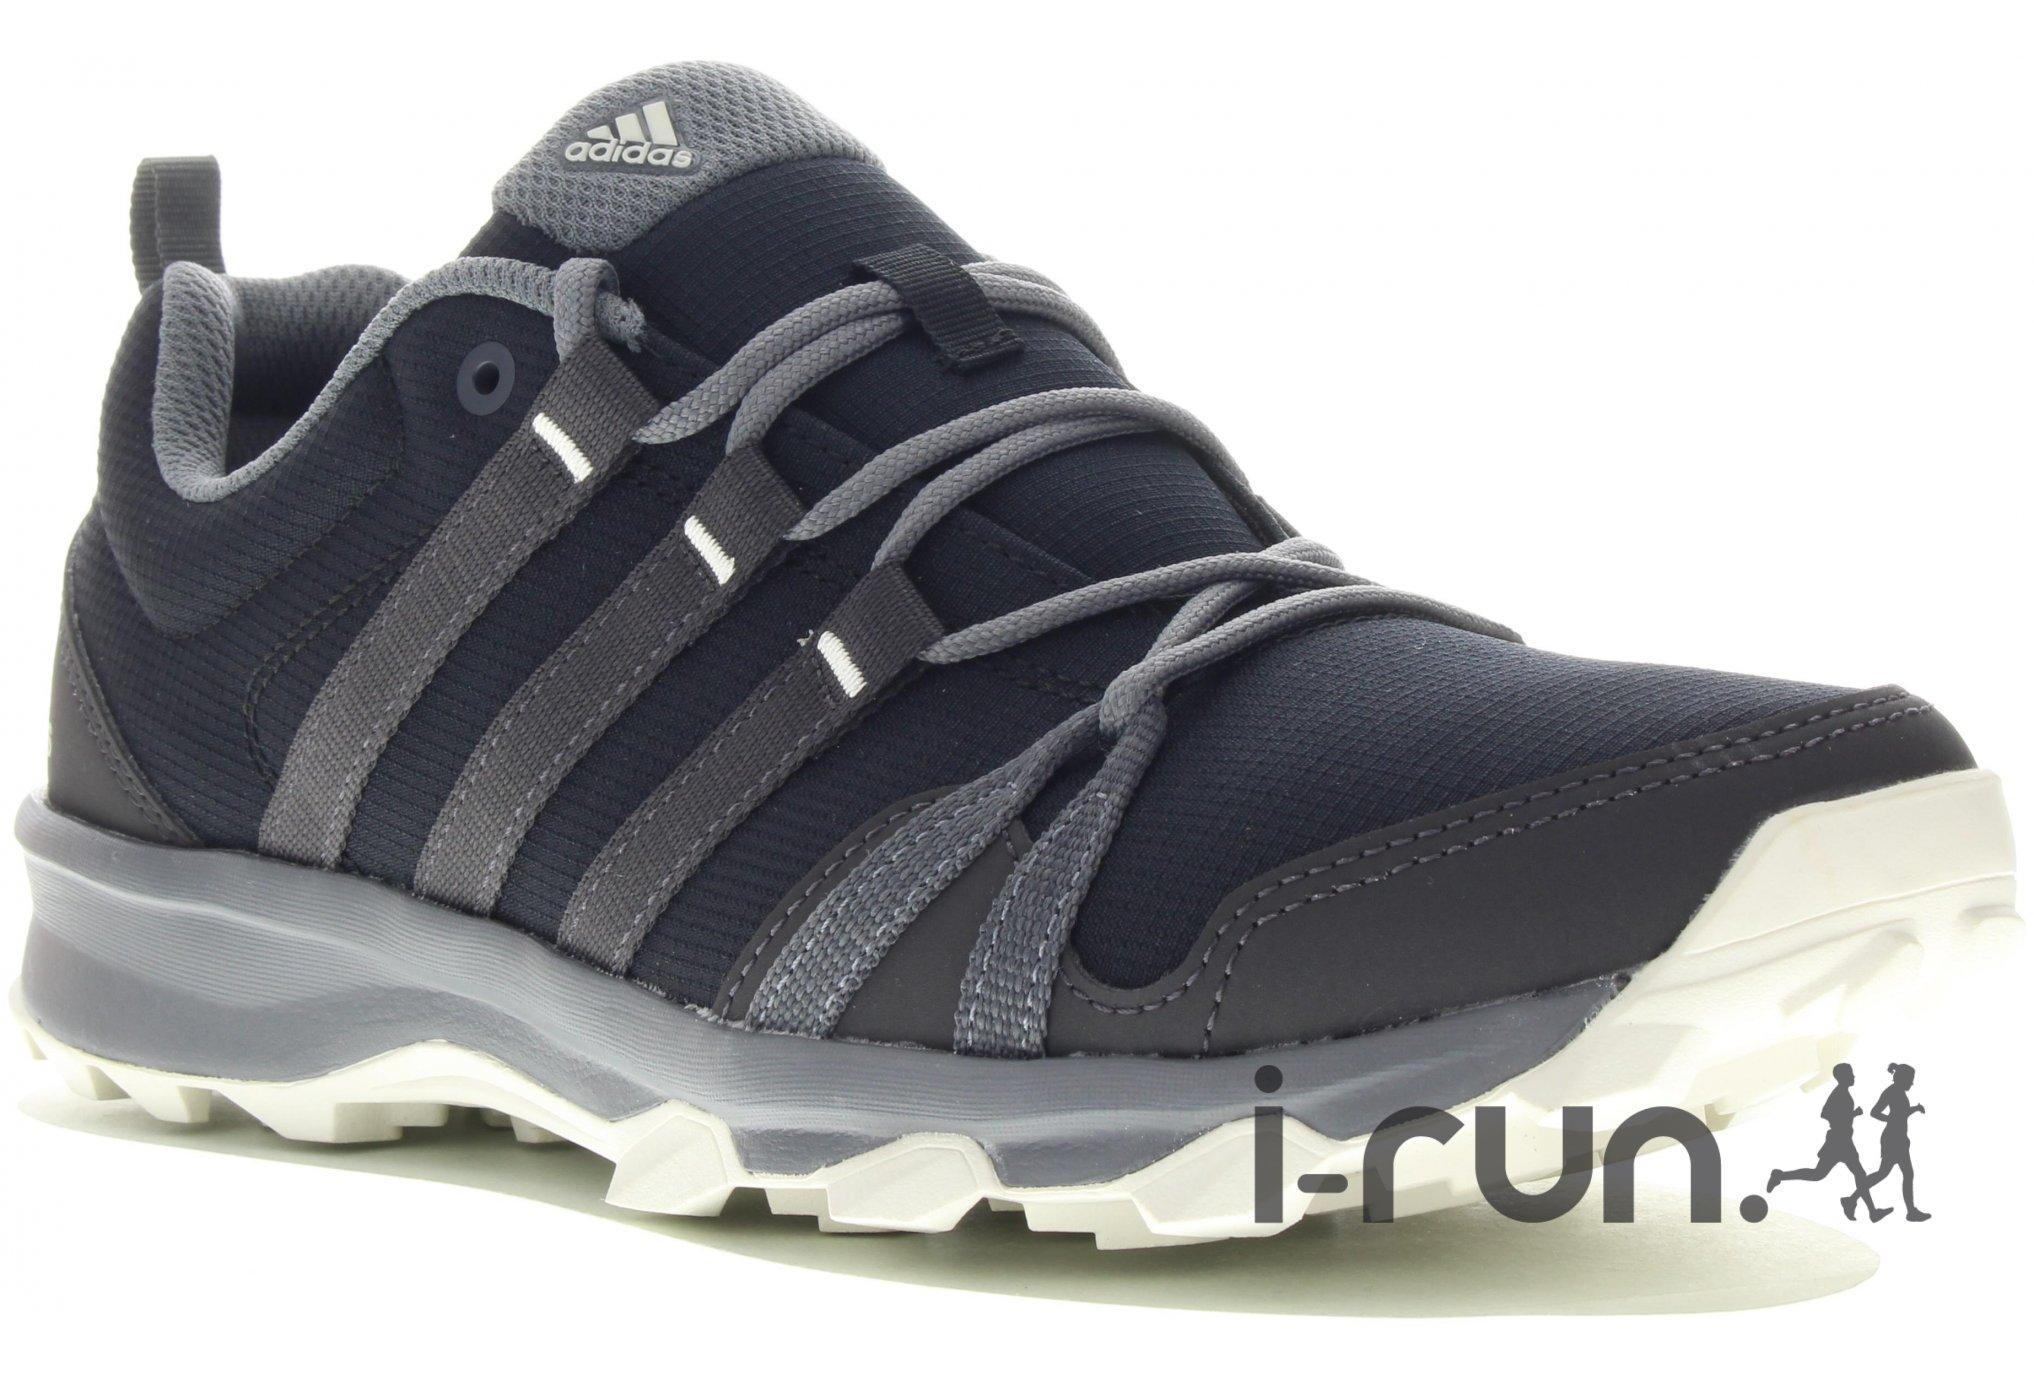 Adidas tracerocker w chaussures running femme